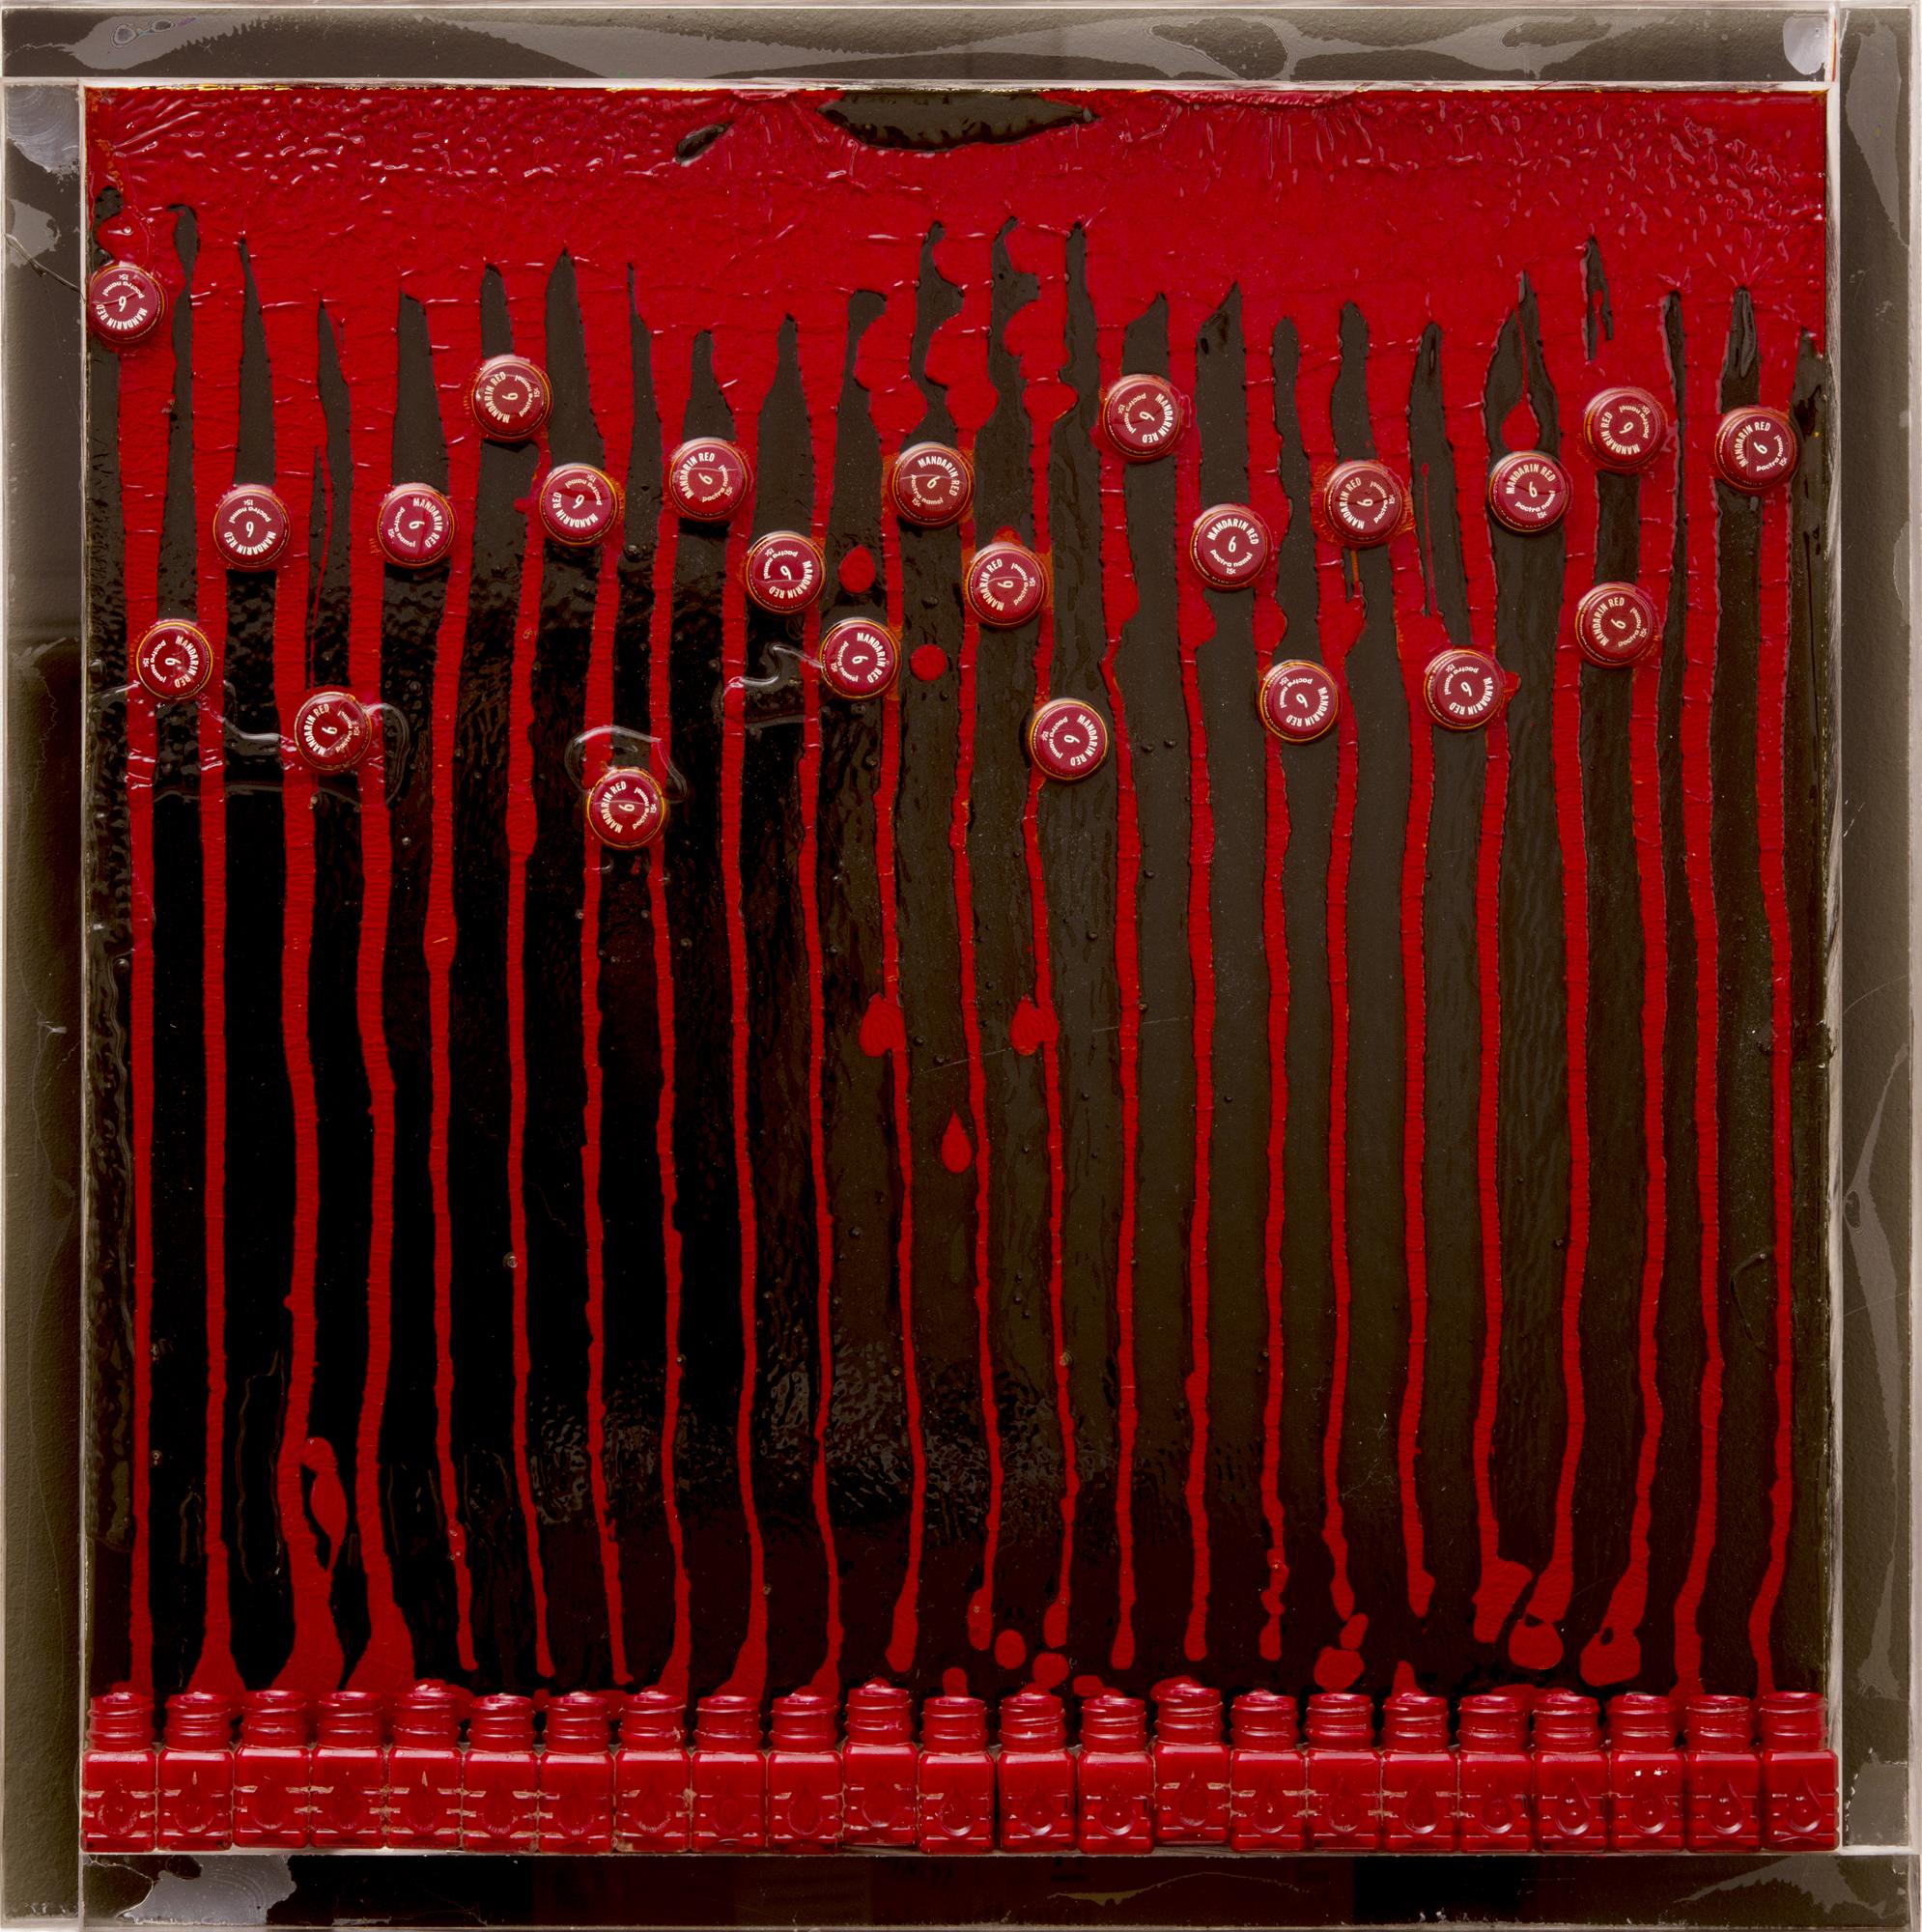 Fernandez Arman   Untitled (Mandarin Red)  1968 Accumulation of acrylic paint, paint bottlesand caps in resin on Plexiglas 61 x 61 cm